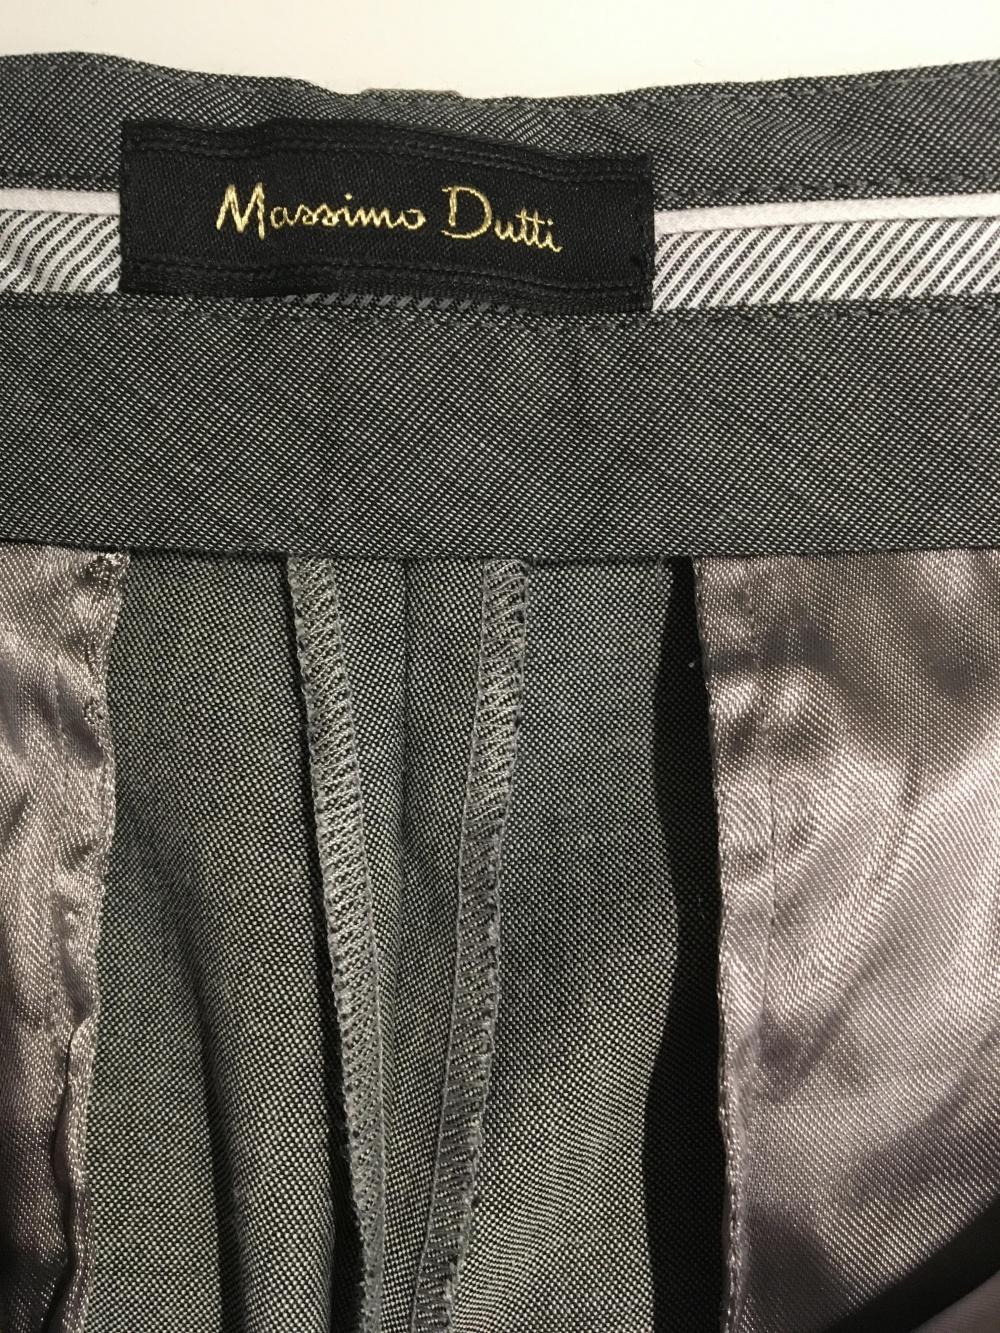 Брюки Massimo Dutti, размер S